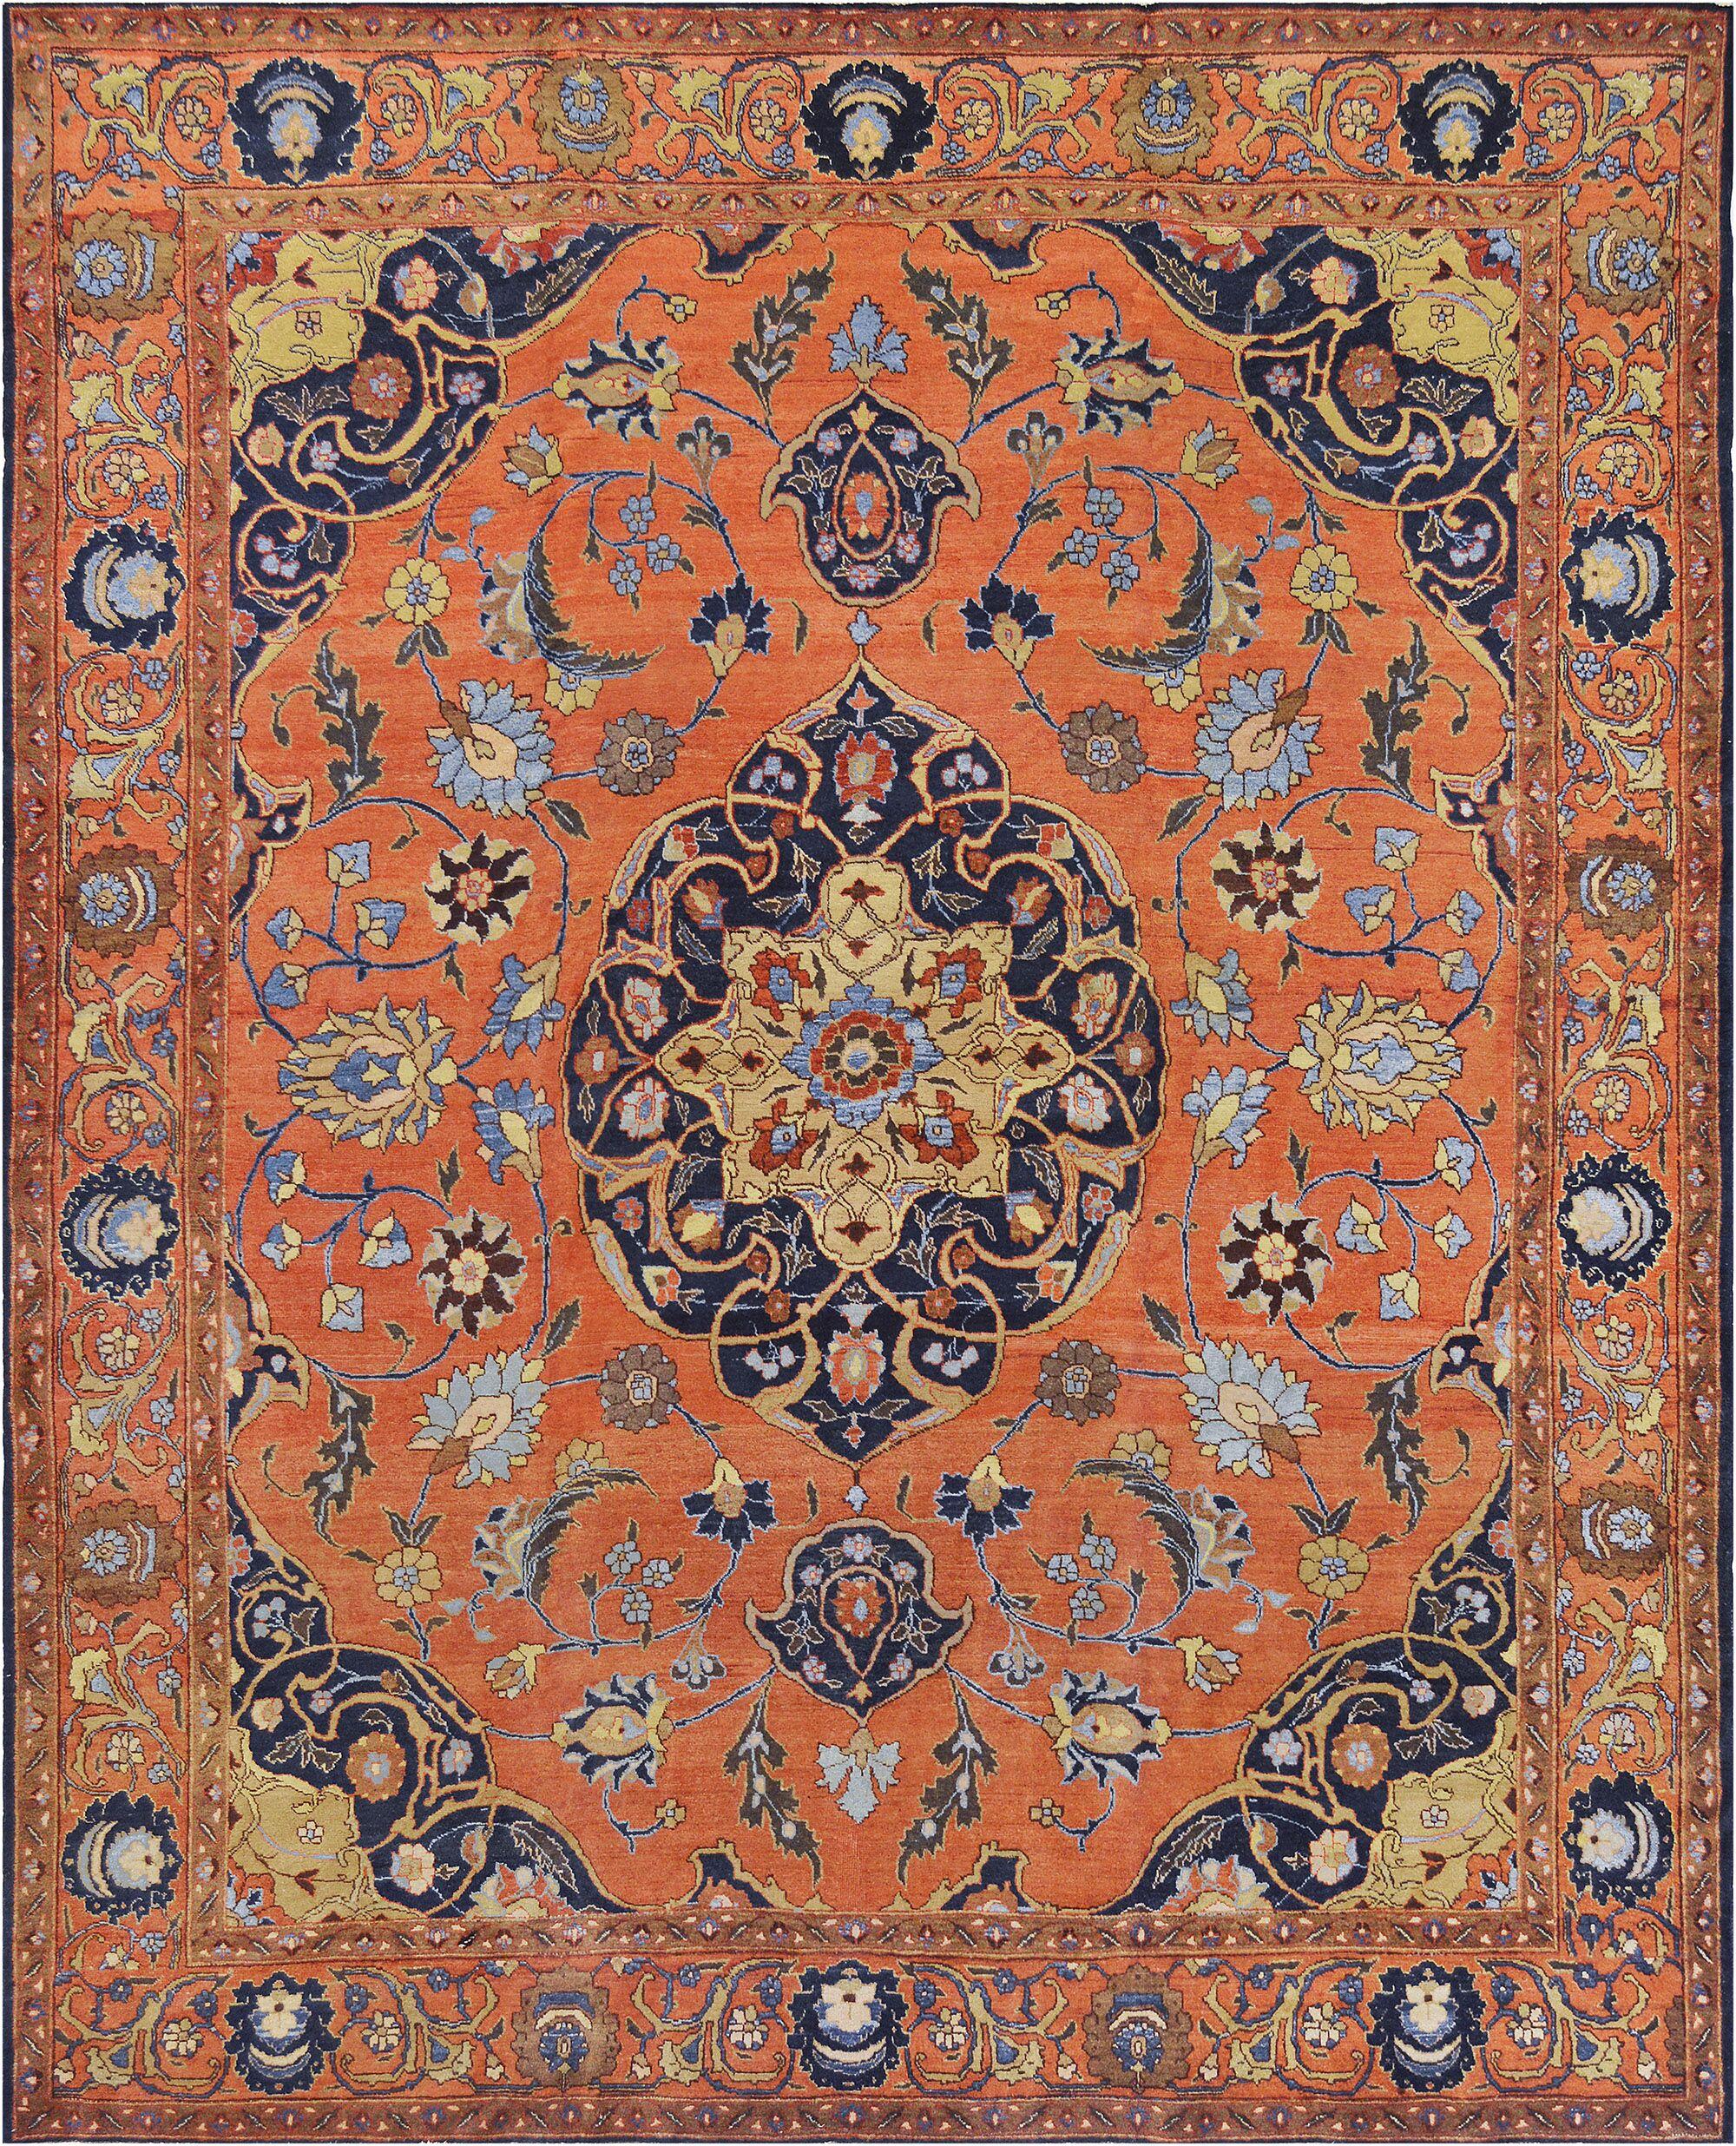 One-of-a-Kind Antique Tabriz Handwoven Wool Orange Indoor Area Rug